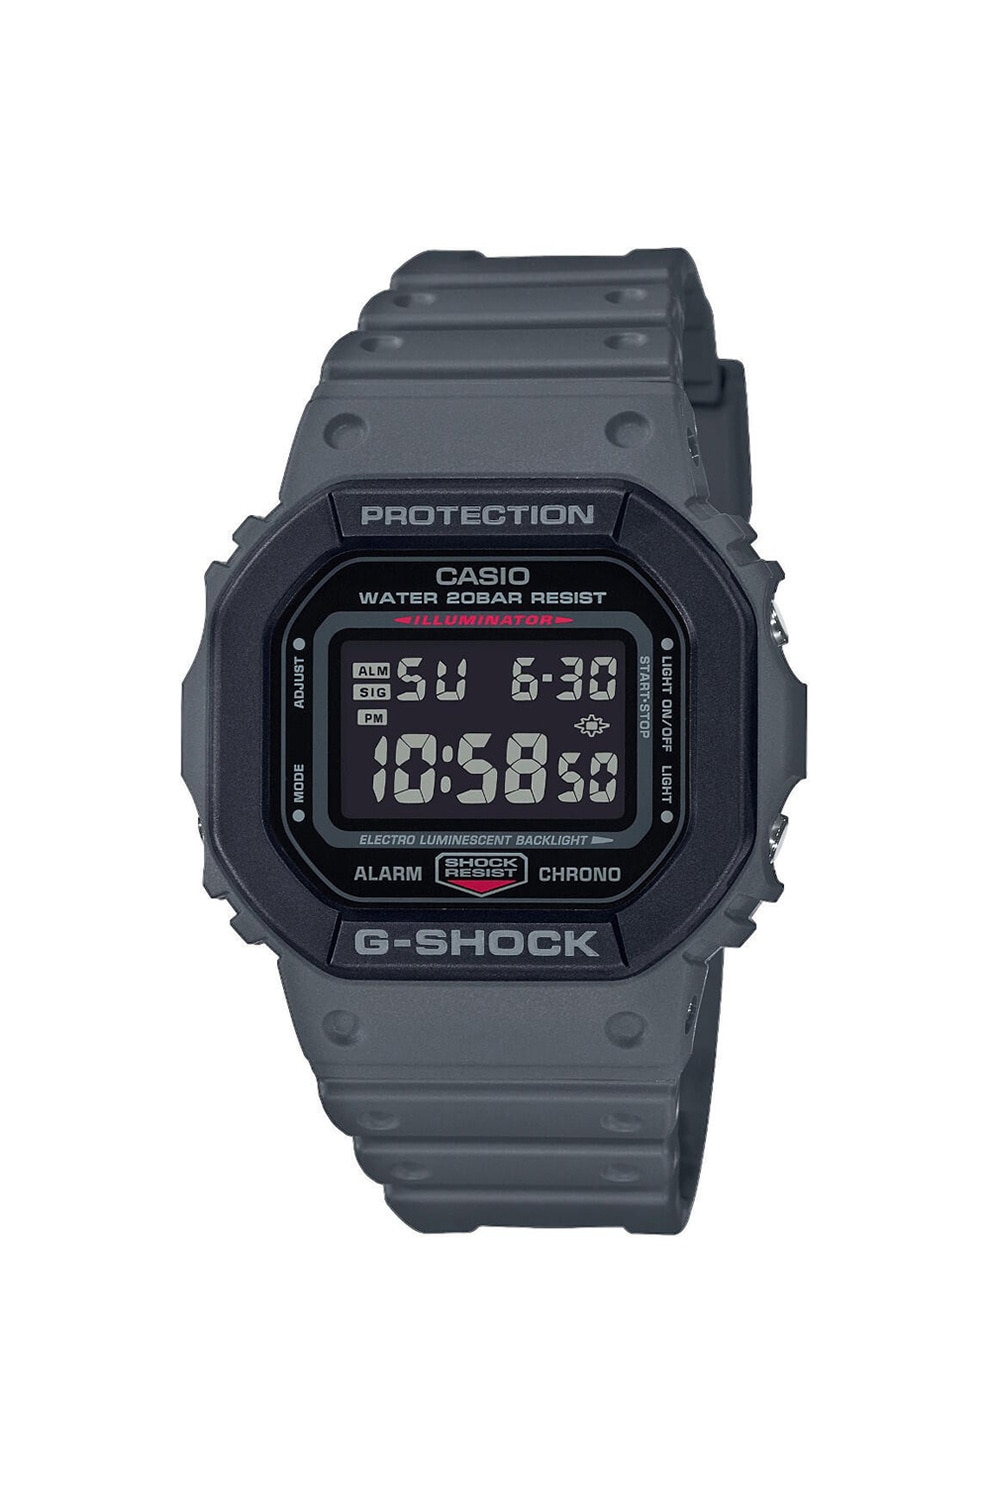 Fotografie Casio, Ceas digital cronograf G-Shock, Negru